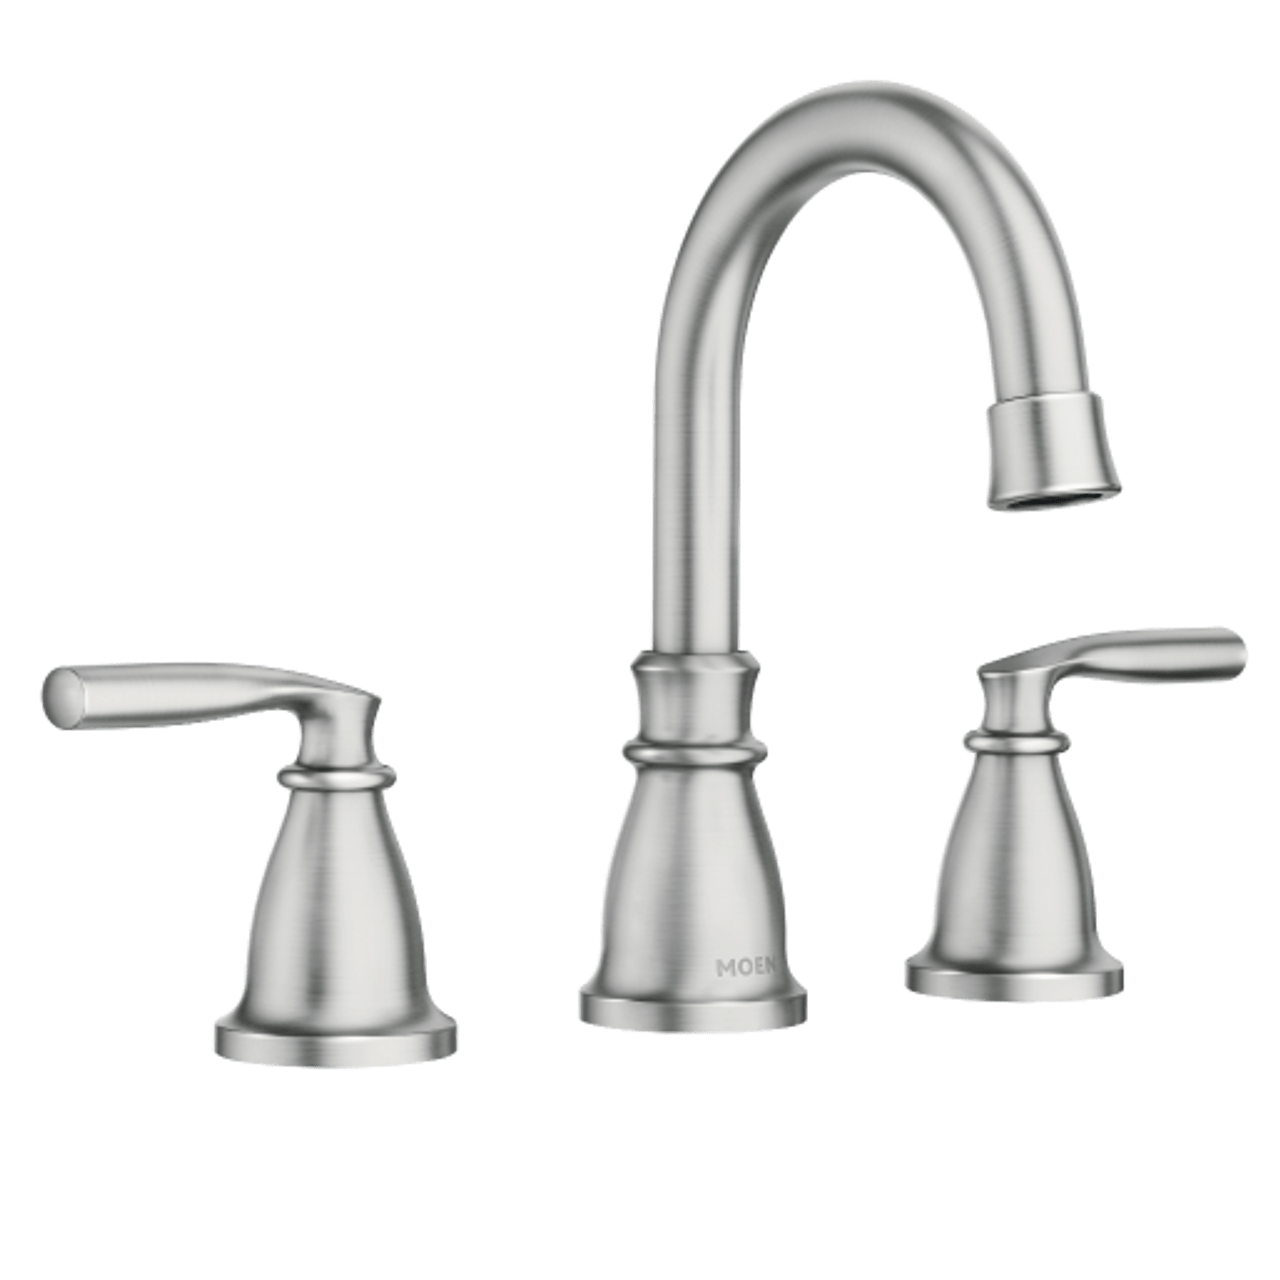 moen hilliard spot resist brushed nickel two handle high arc bathroom faucet